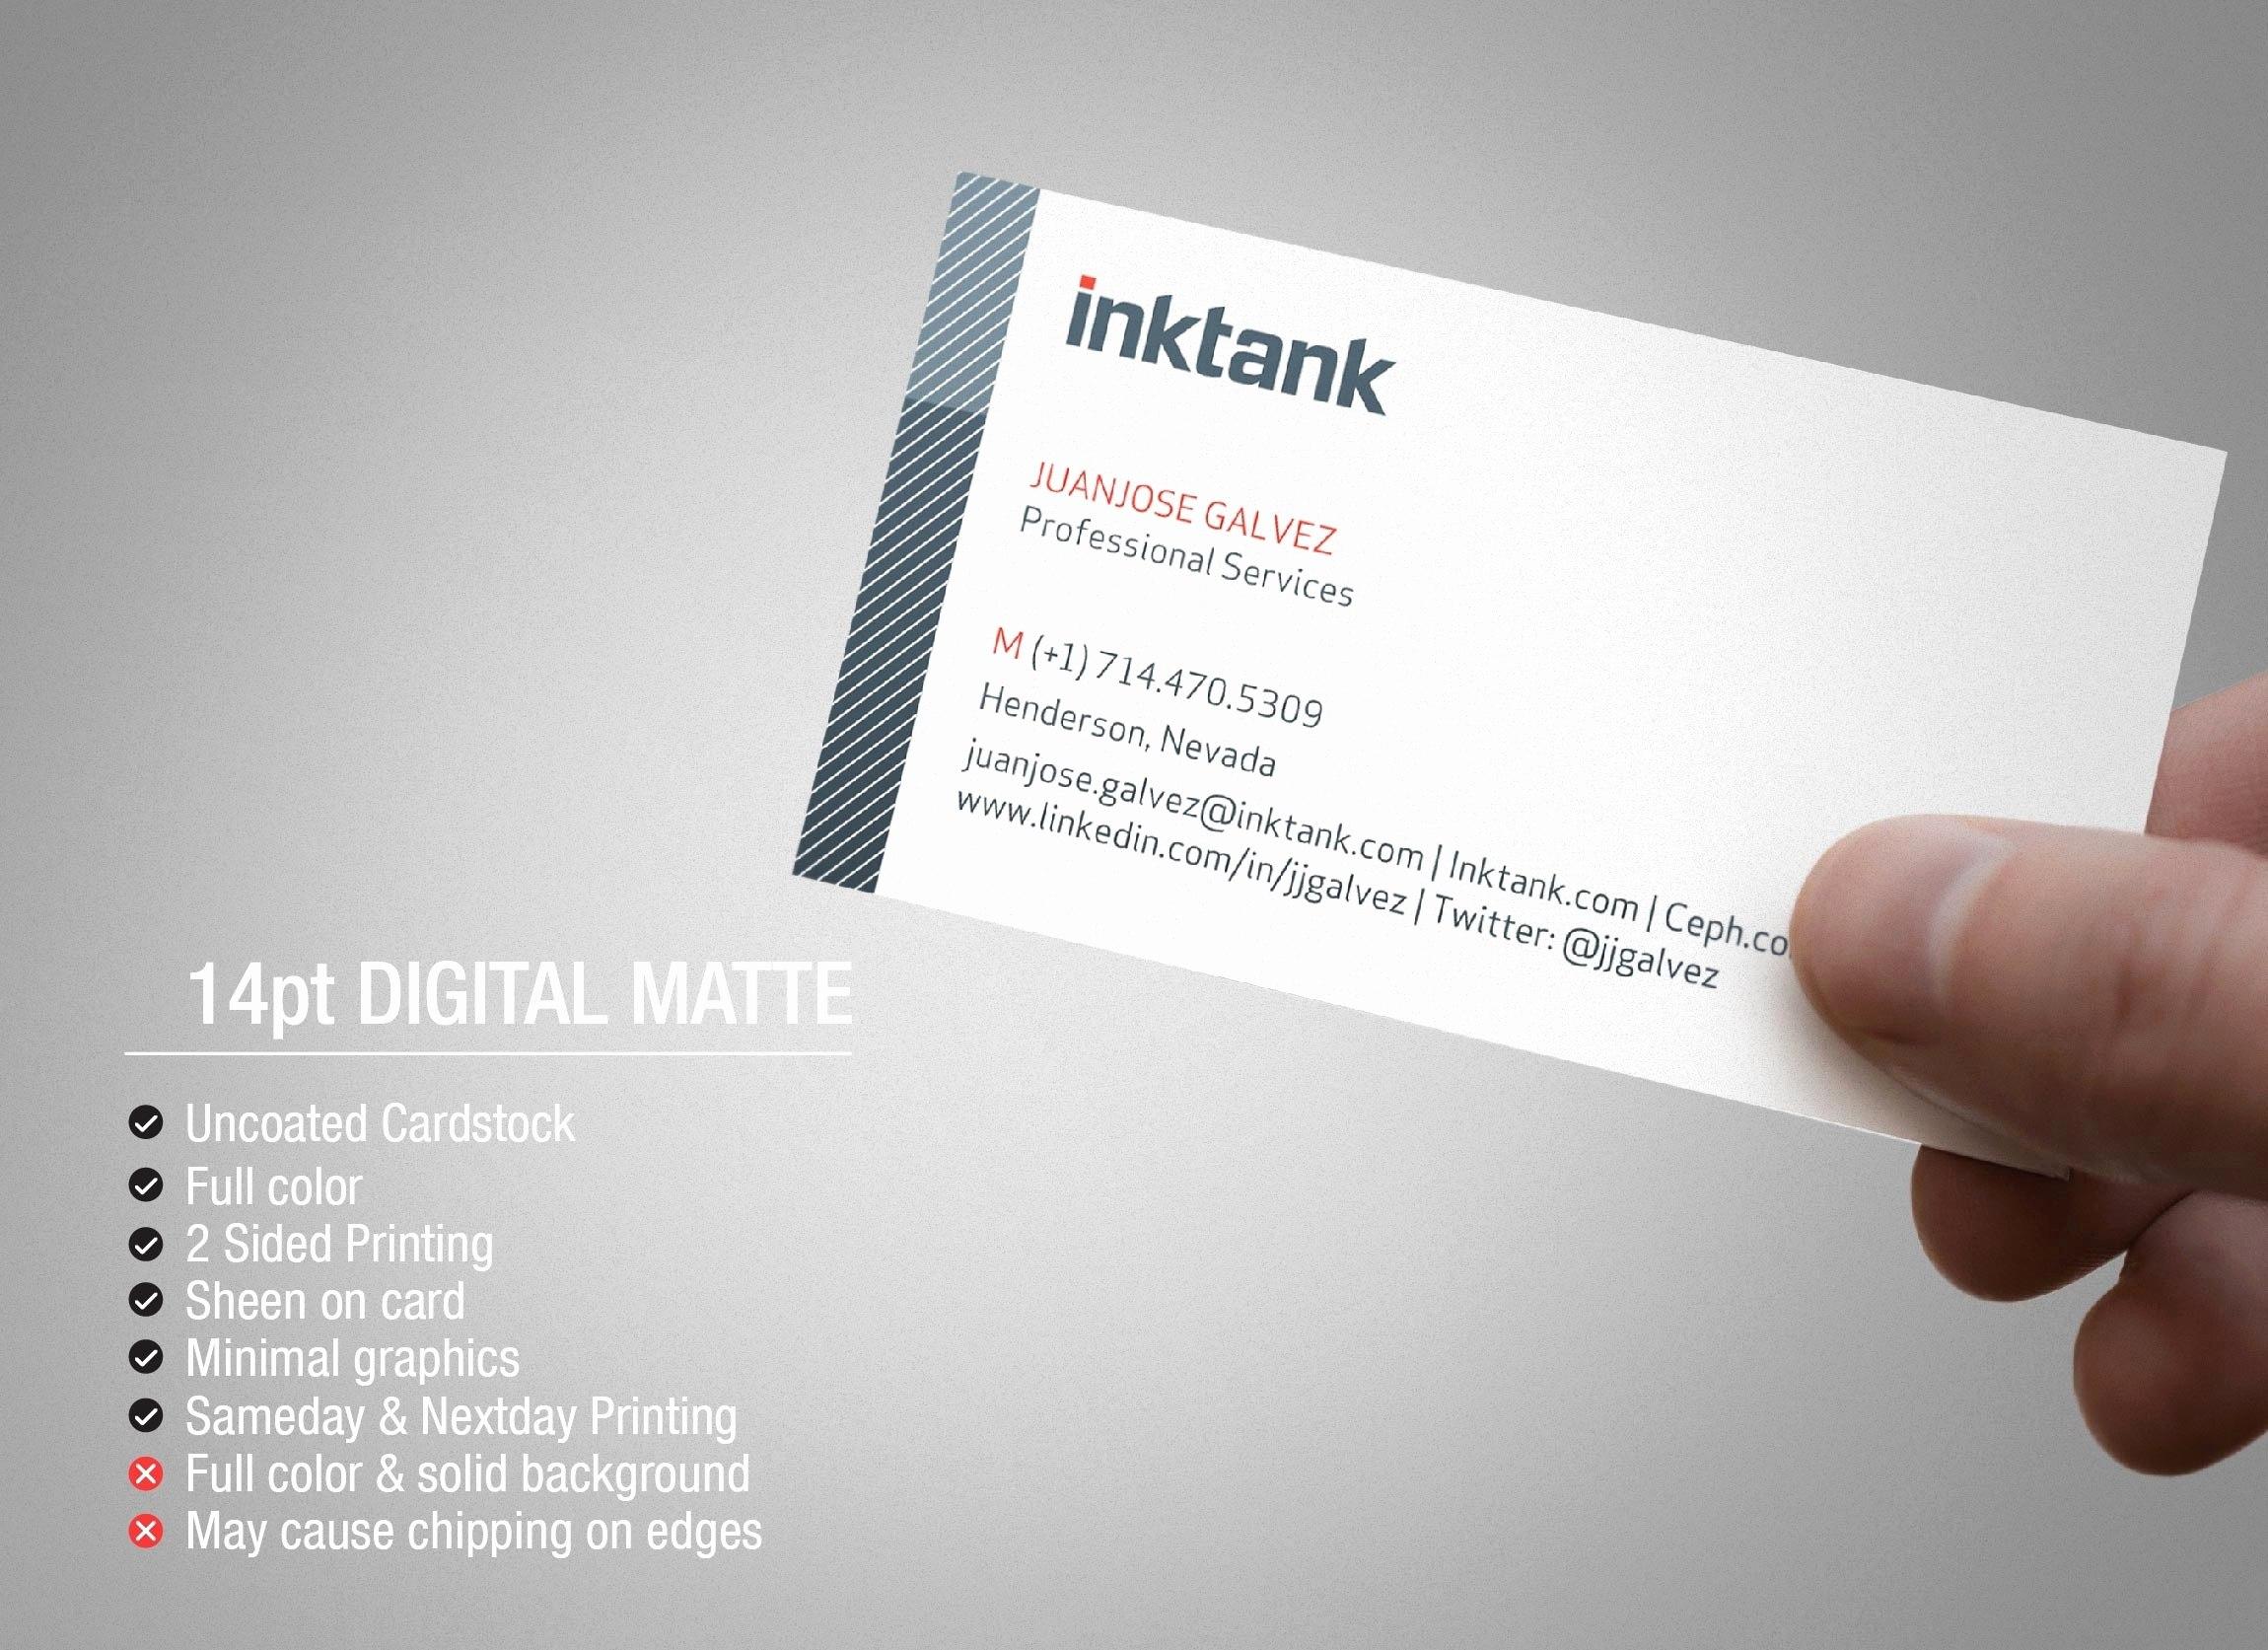 Beautiful Business Cards Kinkos Same Day  Hydraexecutives With Regard To Kinkos Business Card Template